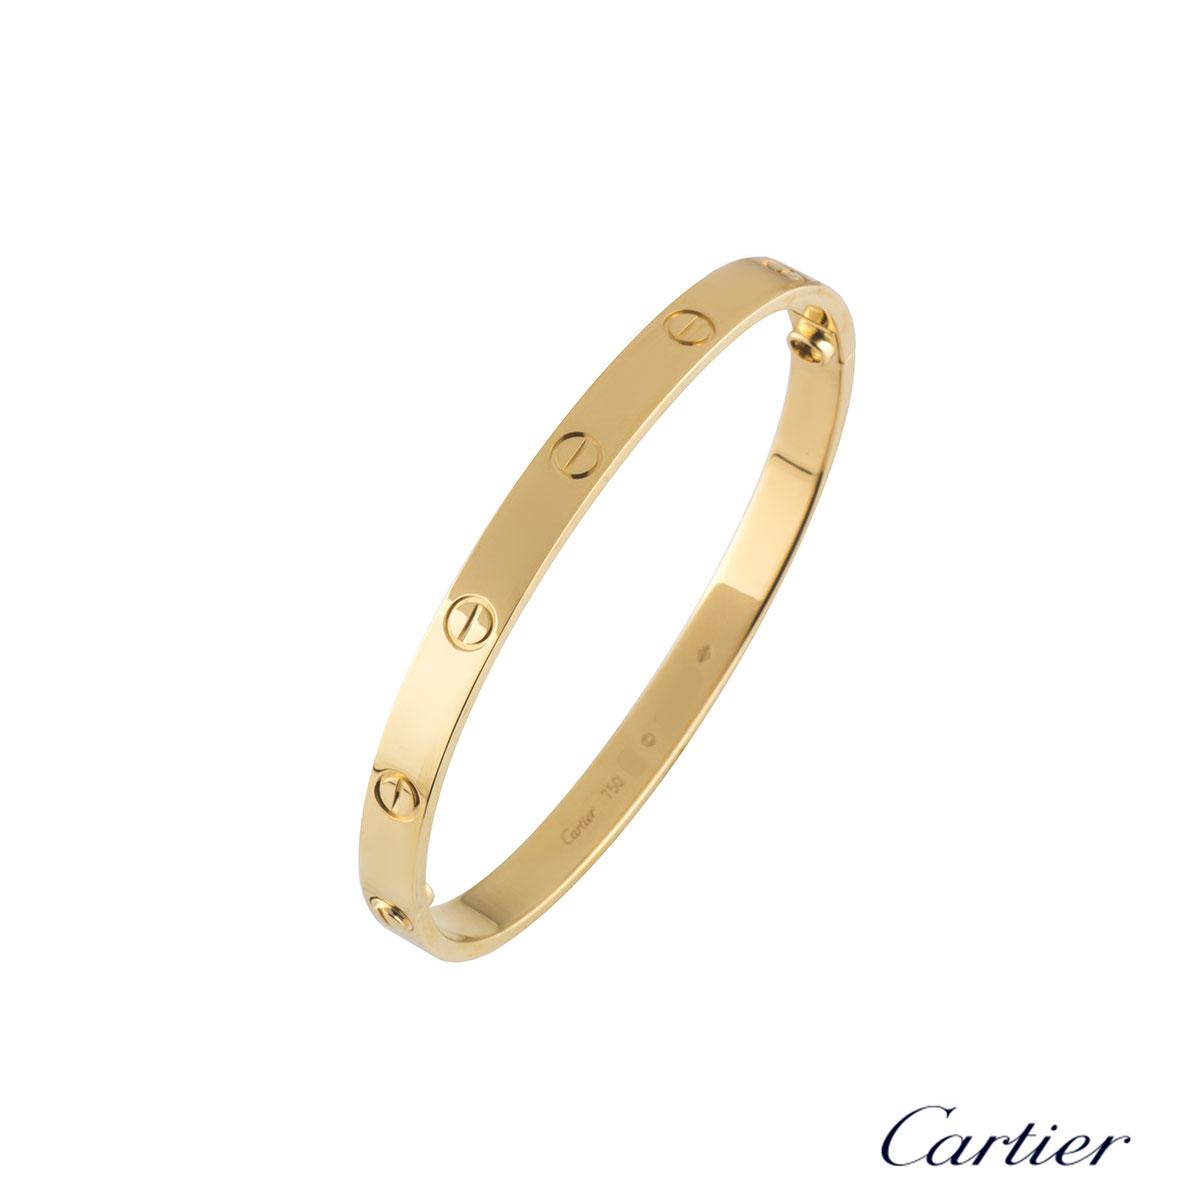 Cartier Yellow Gold Plain Love Bracelet Size 18 B6035518